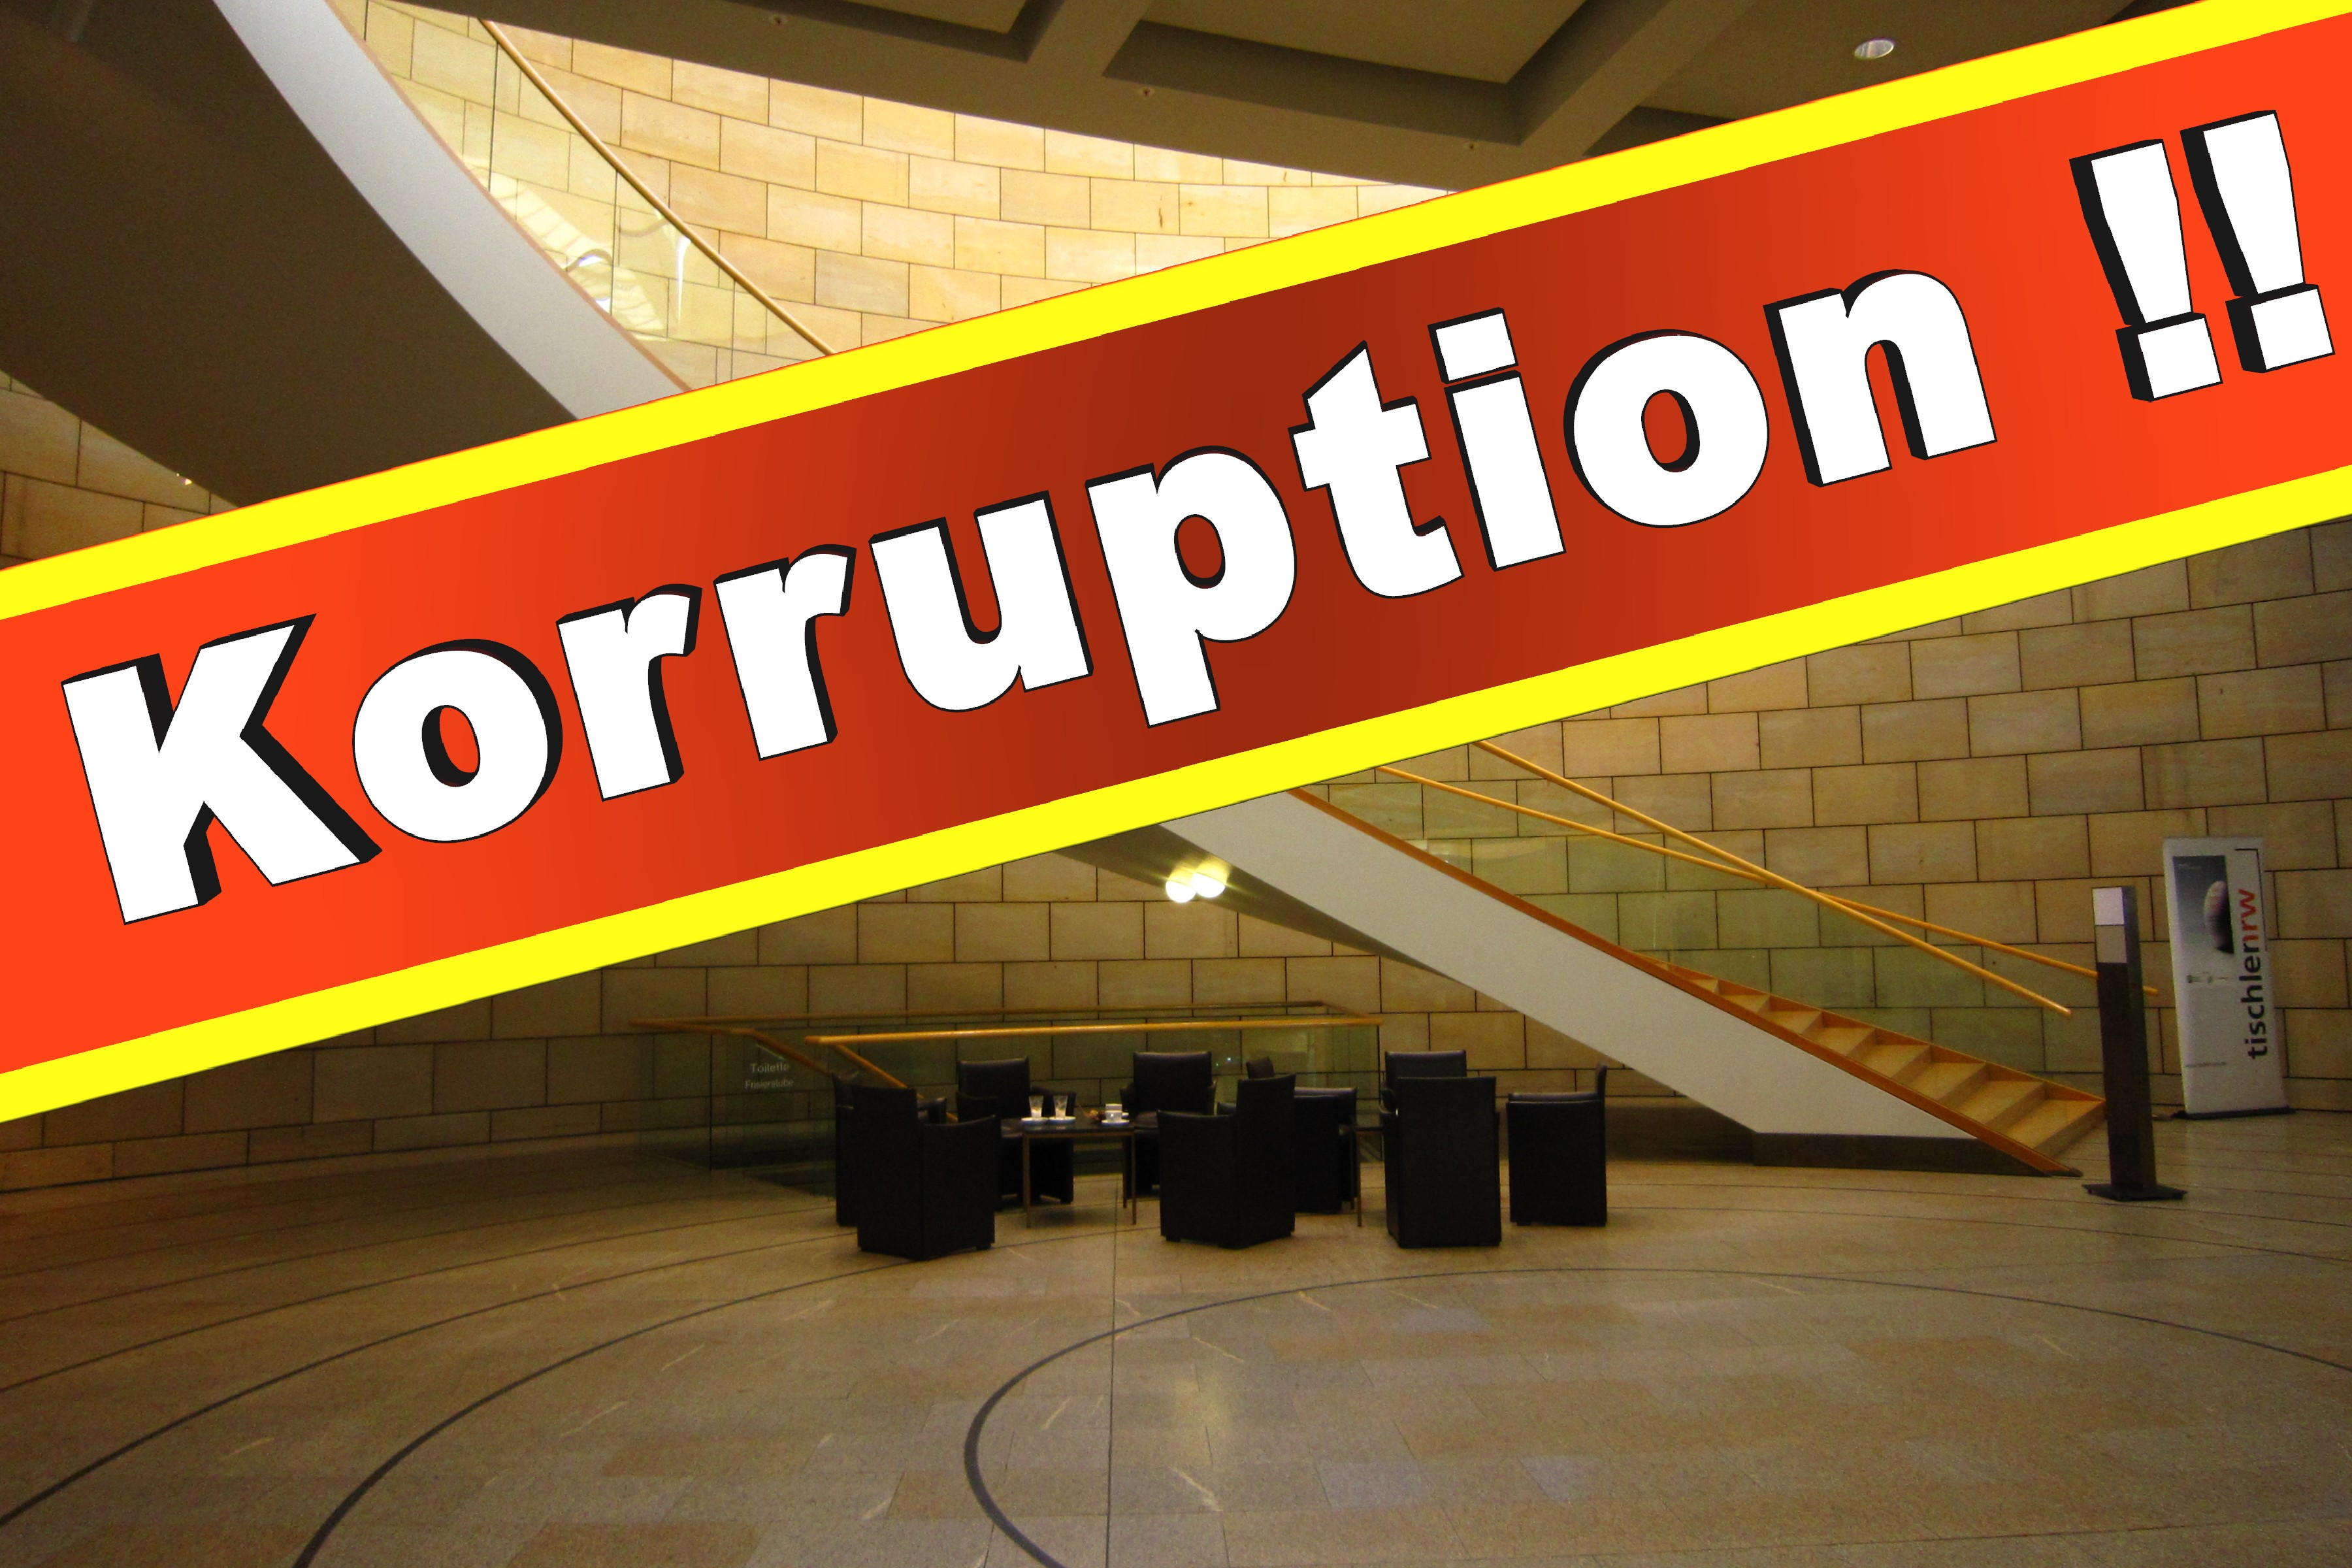 Landtag Nrw Wiki Landtag Nrw Wahlen Nrw Landtag Koalition Nrw Landtag Sitzverteilung Landtag Nrw 2017 Landtag Nrw Jobs Landtag Of North Rhine Westphalia Political (1)